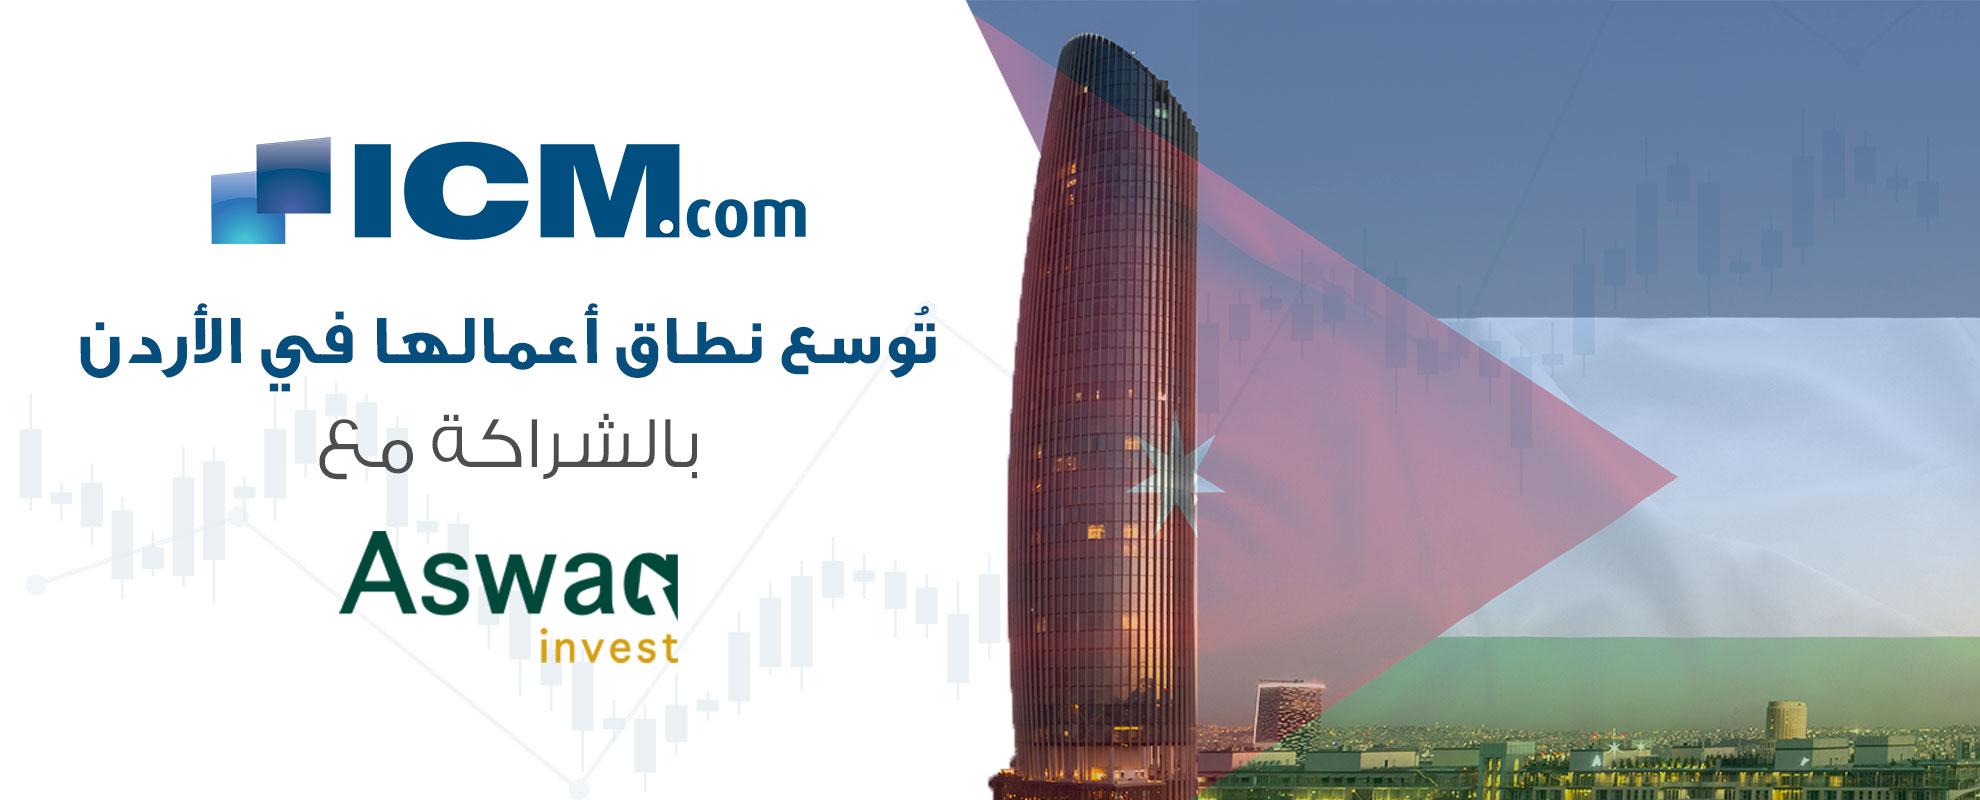 ICM.com تُعزز من تواجدها الفعال في الشرق الأوسط بحصولها على اعتماد من هيئة الأوراق المالية الأردنية (JSC).